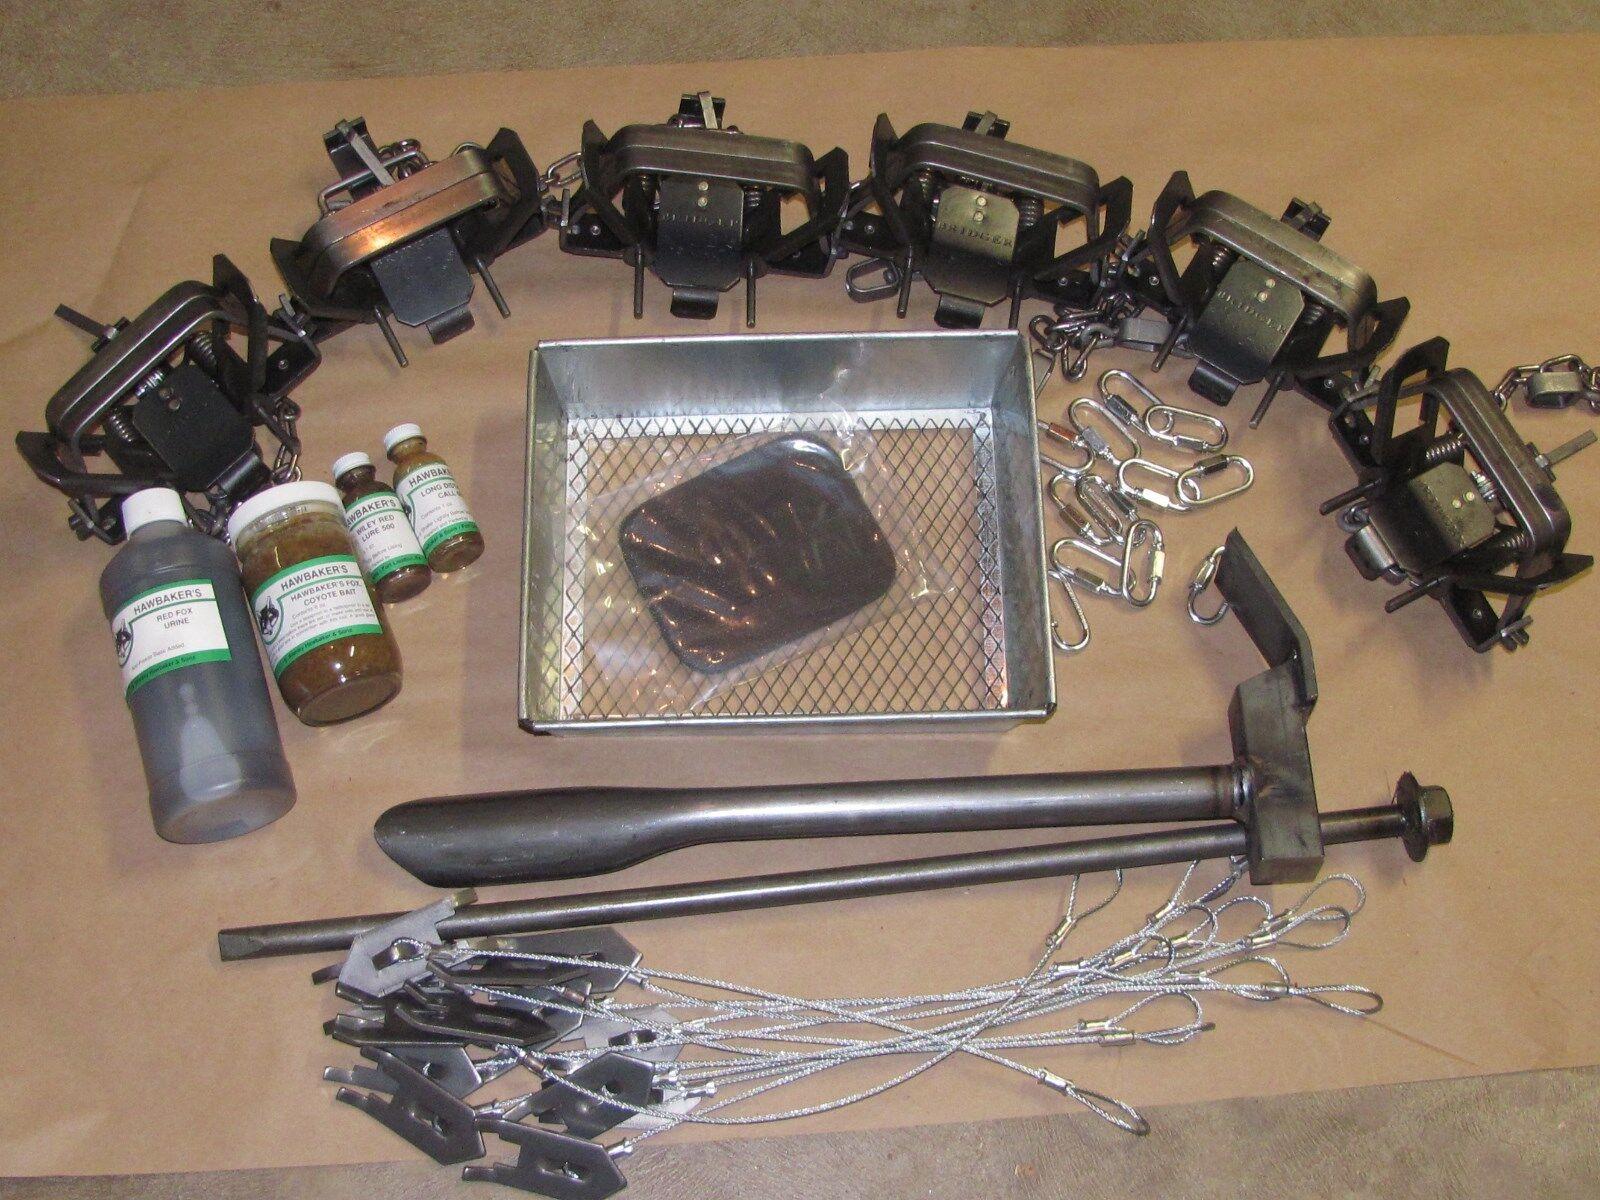 Fox caza con trampas paquete 6 Bridger coilspring Kit Fox Coyote mapache Nueva Venta